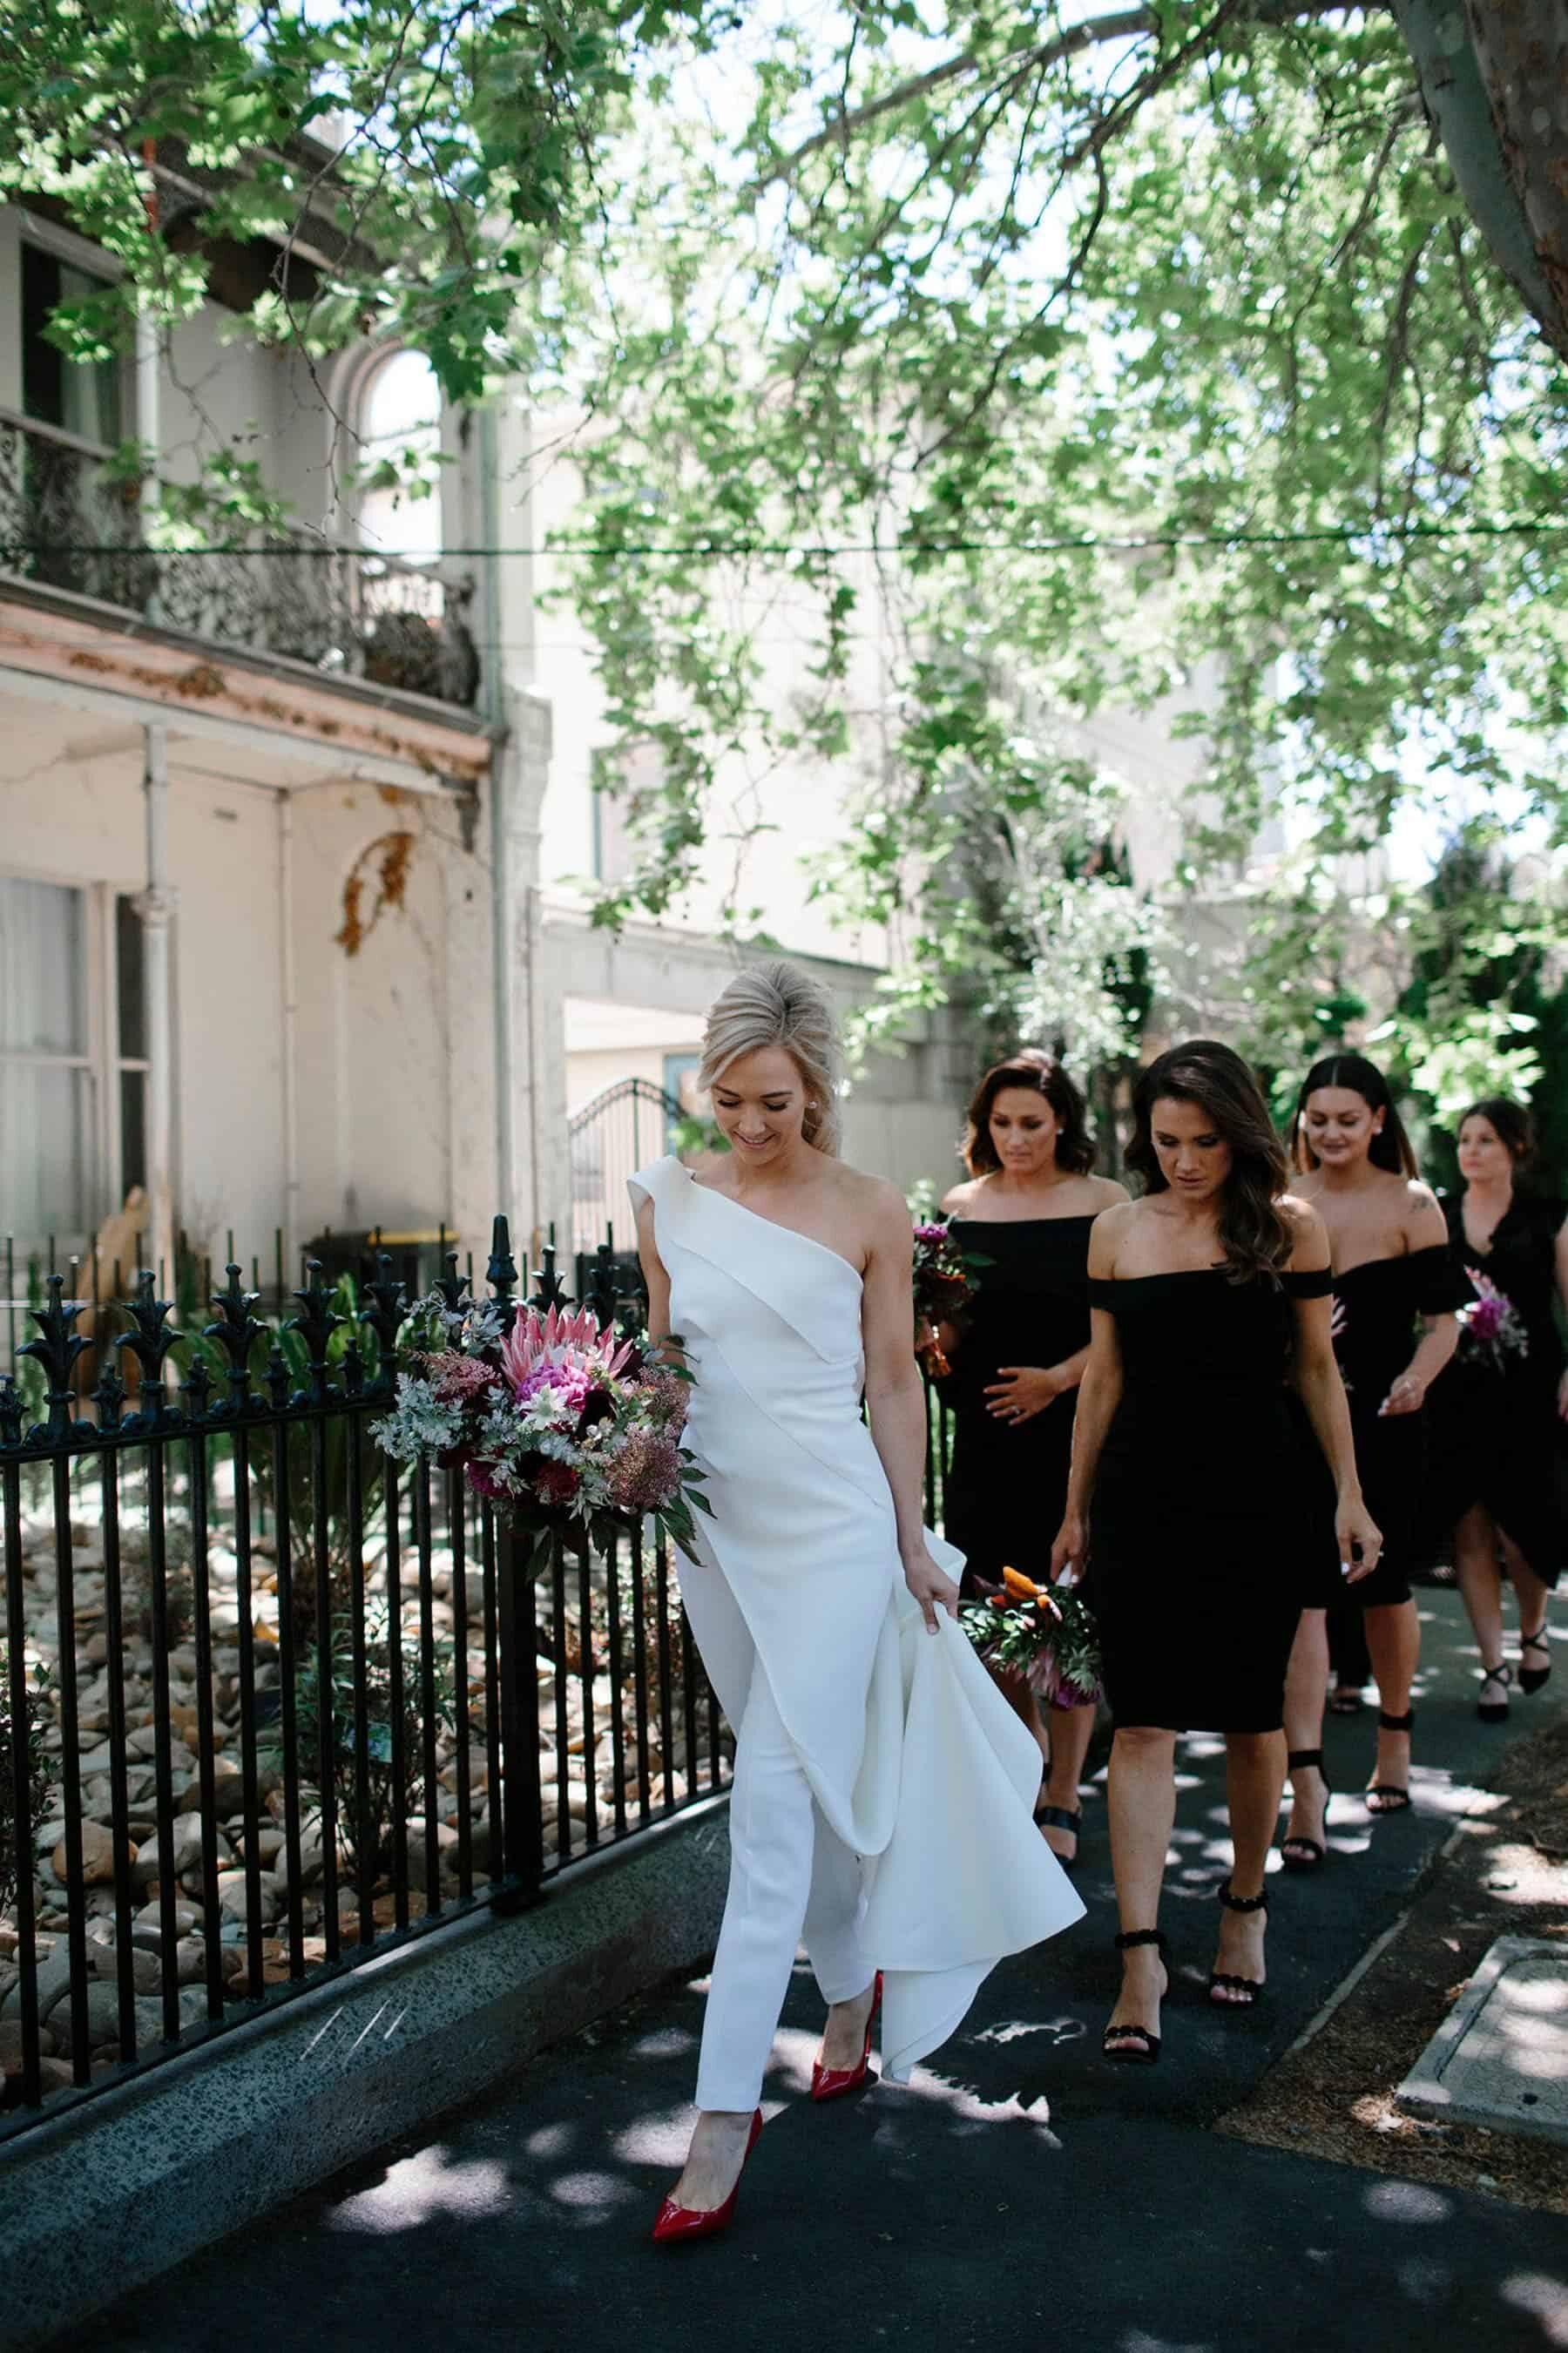 modern white bridal jumpsuit by Toni Maticevski